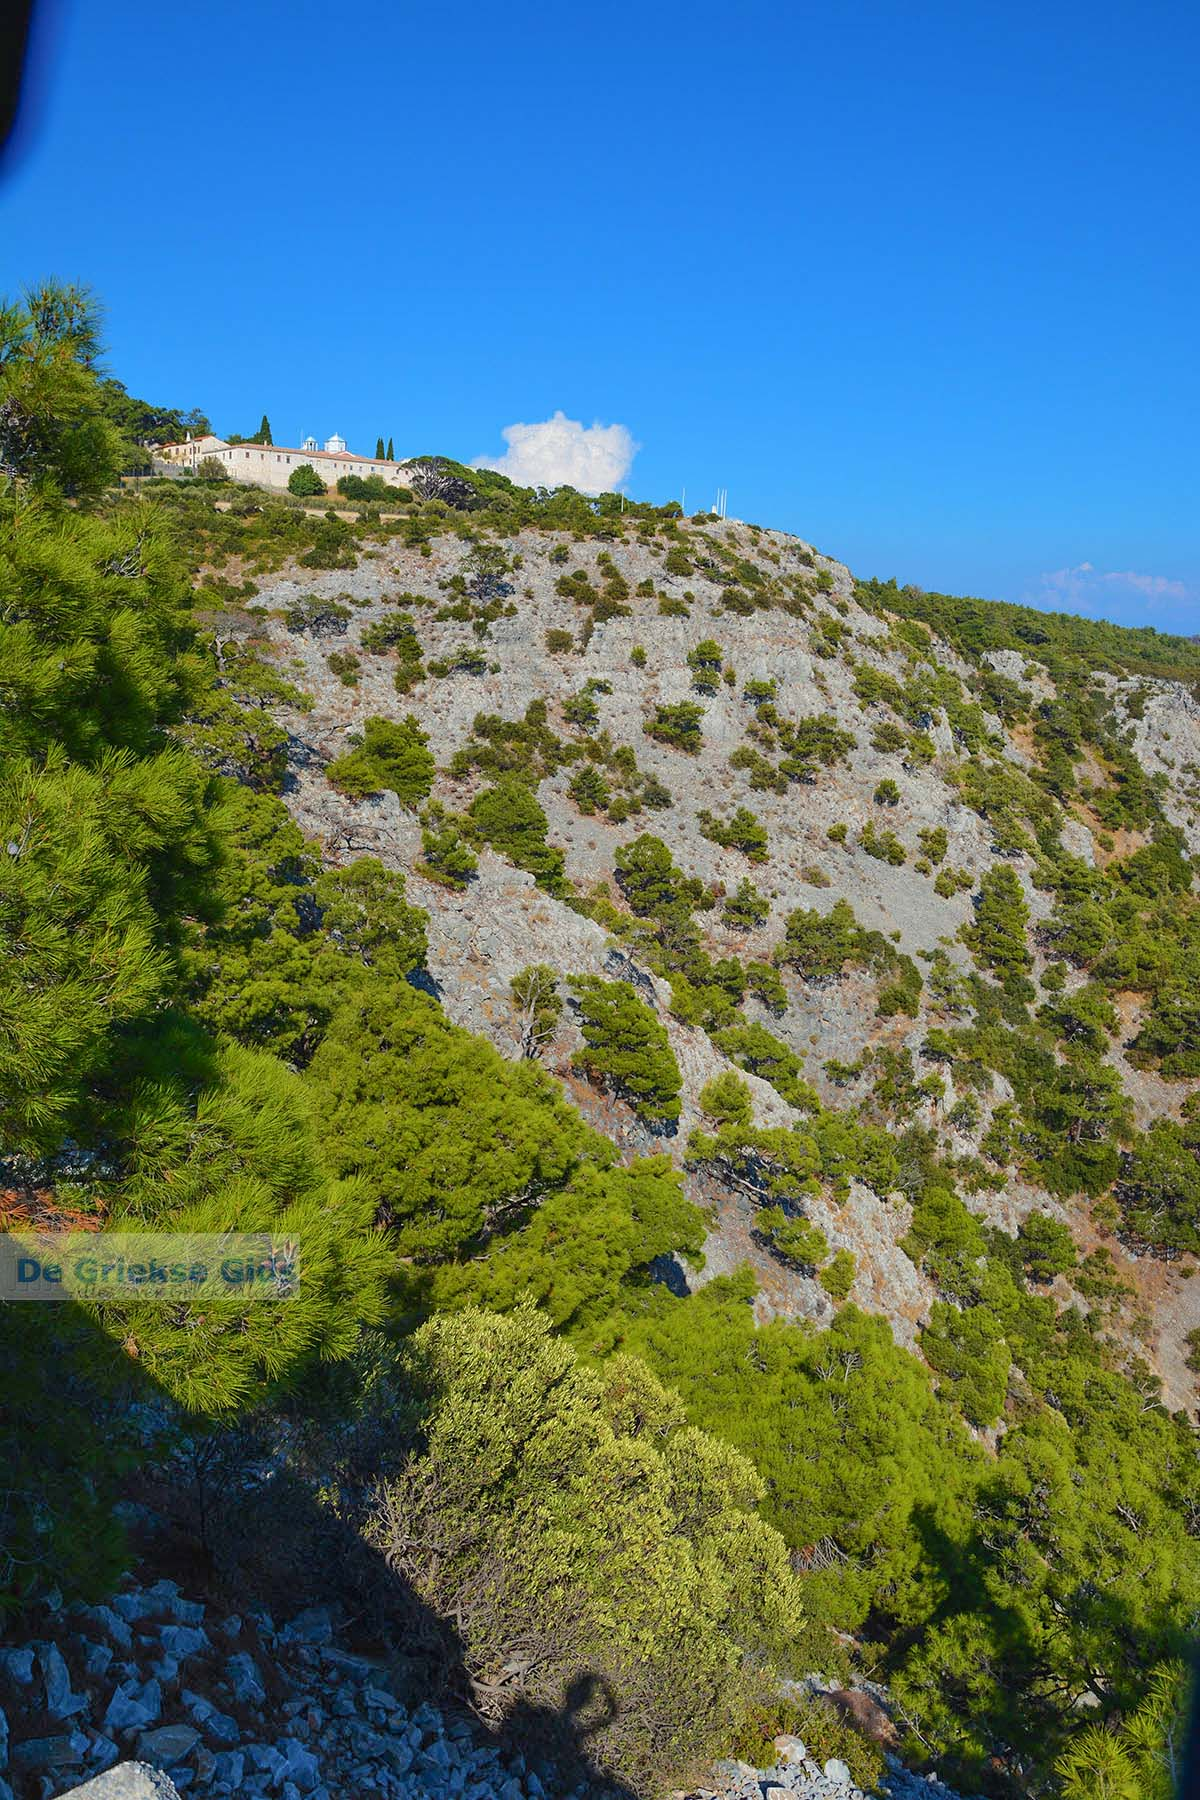 foto Zoodochou Pigis klooster bij Baai Mourtia Samos | Griekenland | Foto 16